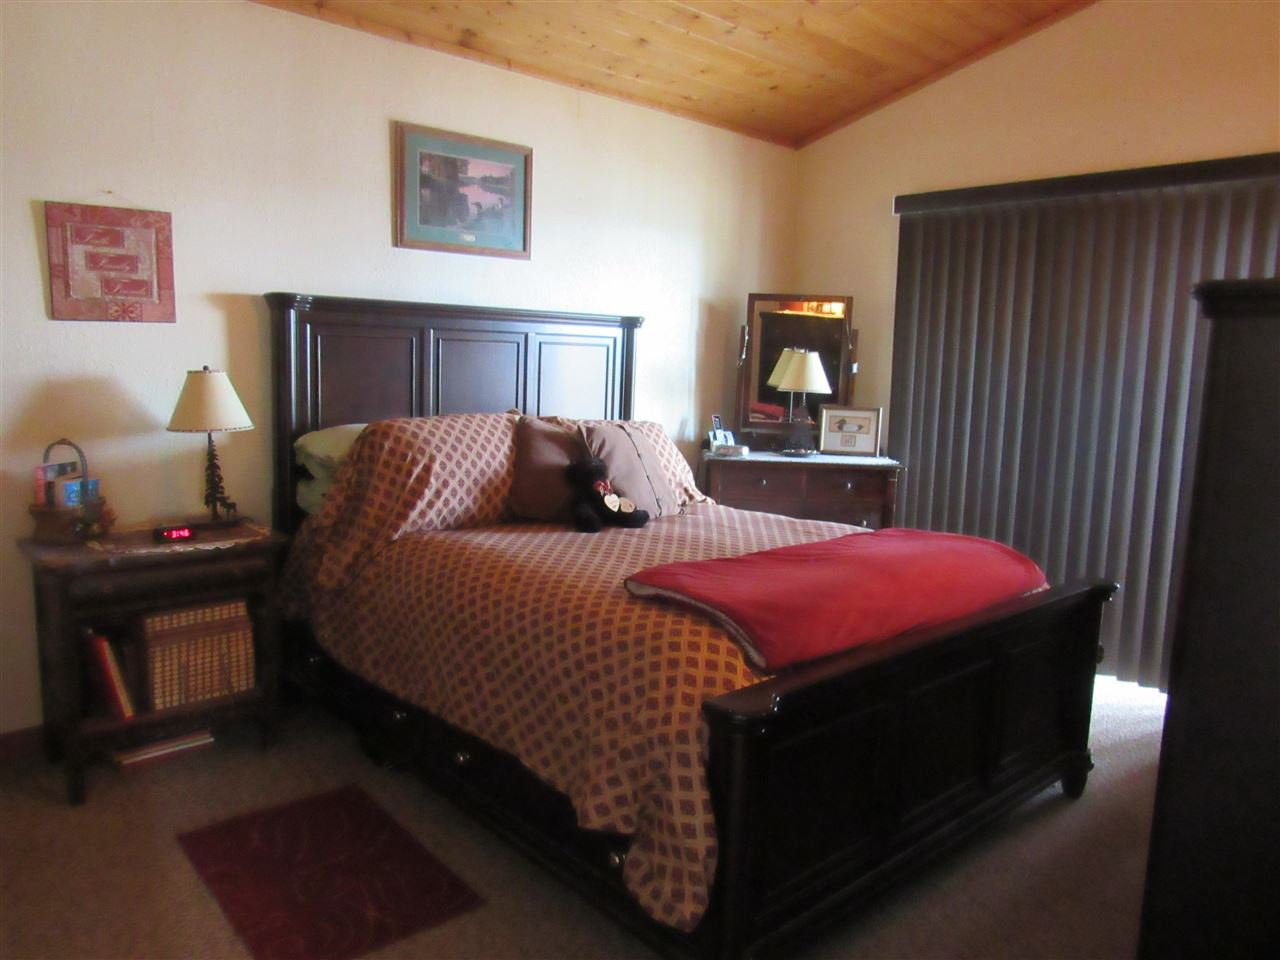 Photo 25: Photos: 3126 ELSEY Road in Williams Lake: Williams Lake - Rural West House for sale (Williams Lake (Zone 27))  : MLS®# R2467730